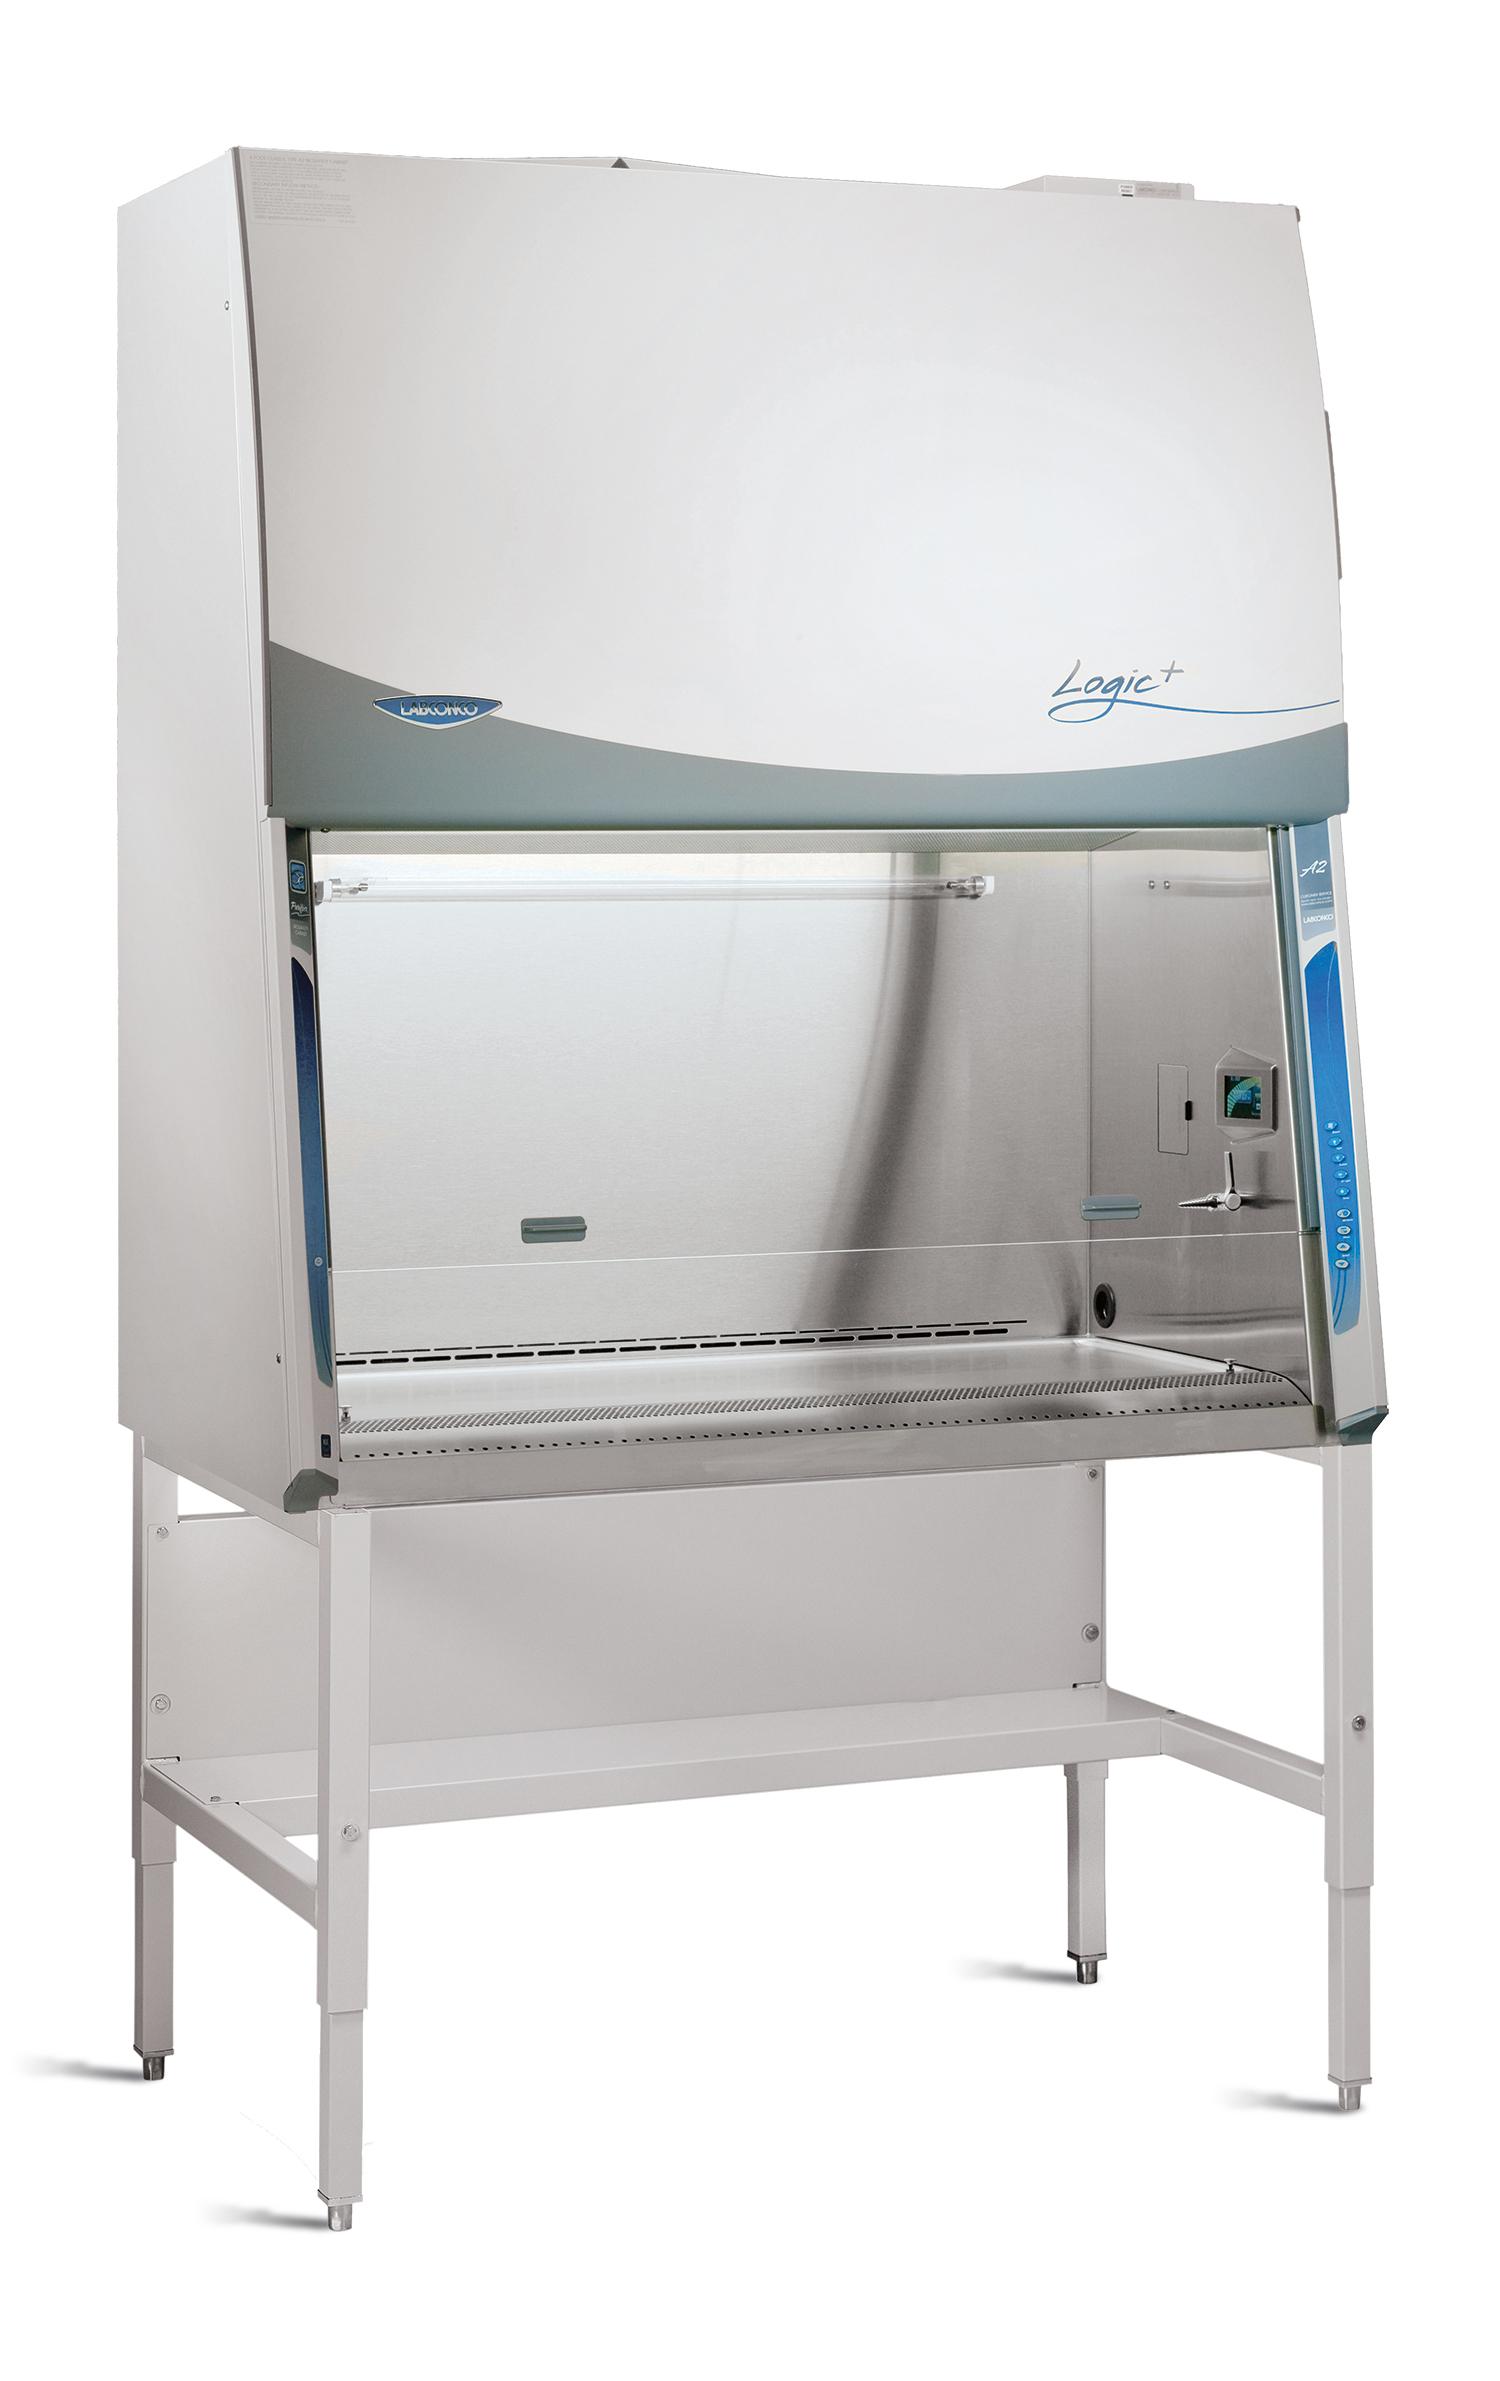 Cabina de Seguridad Biológica Modelo Purifier Logic + Clase II, tipo A2 Image